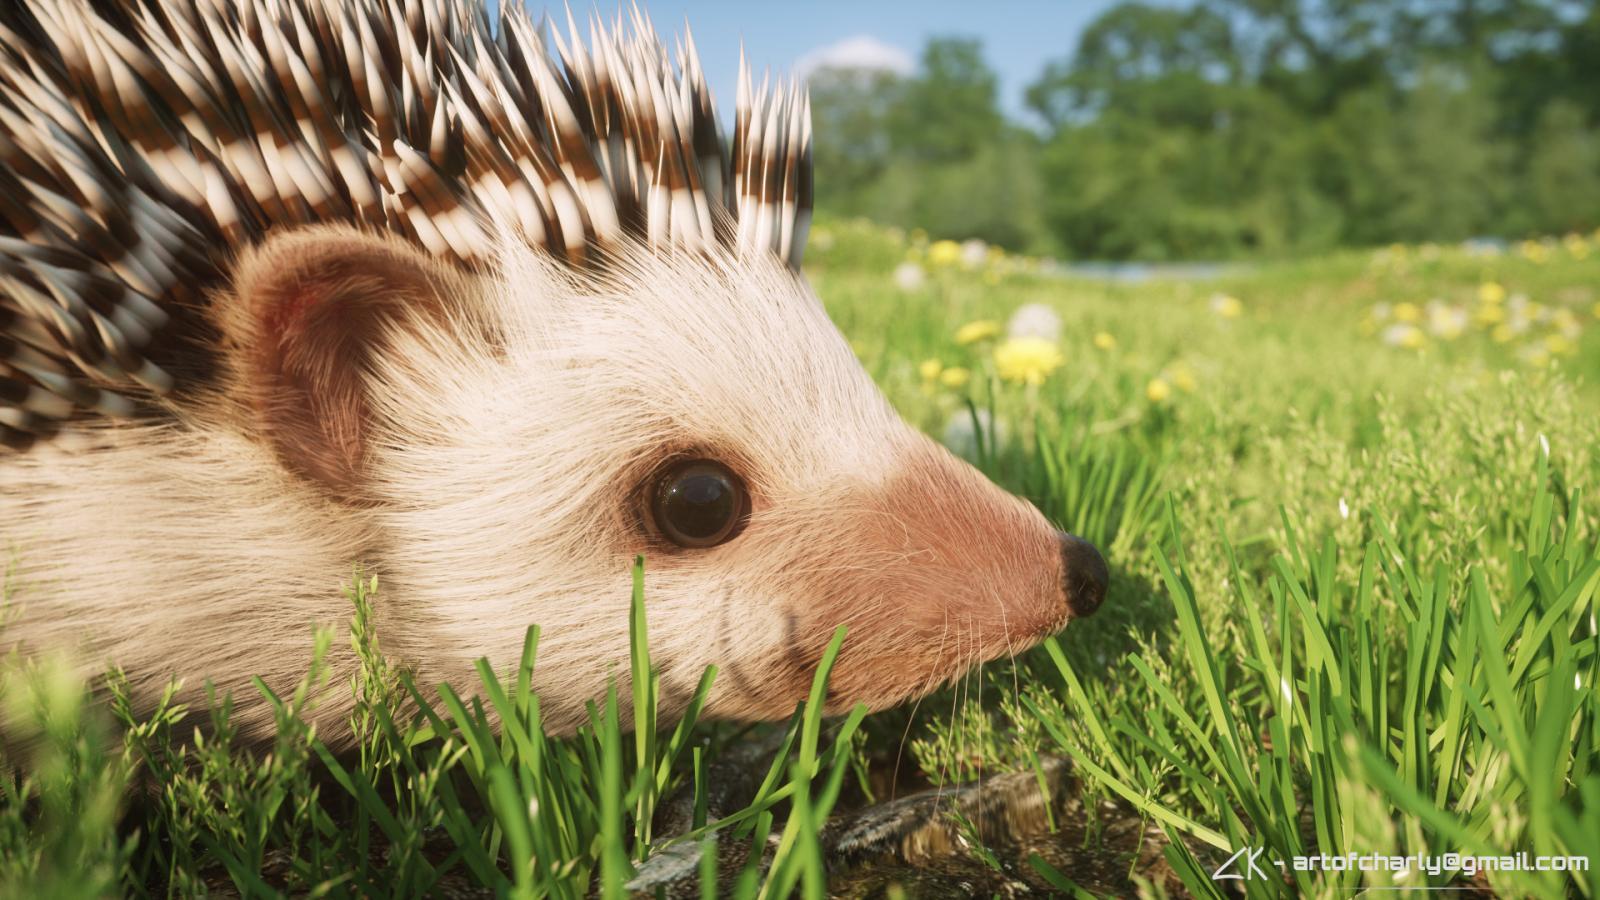 Hedgehog 2017